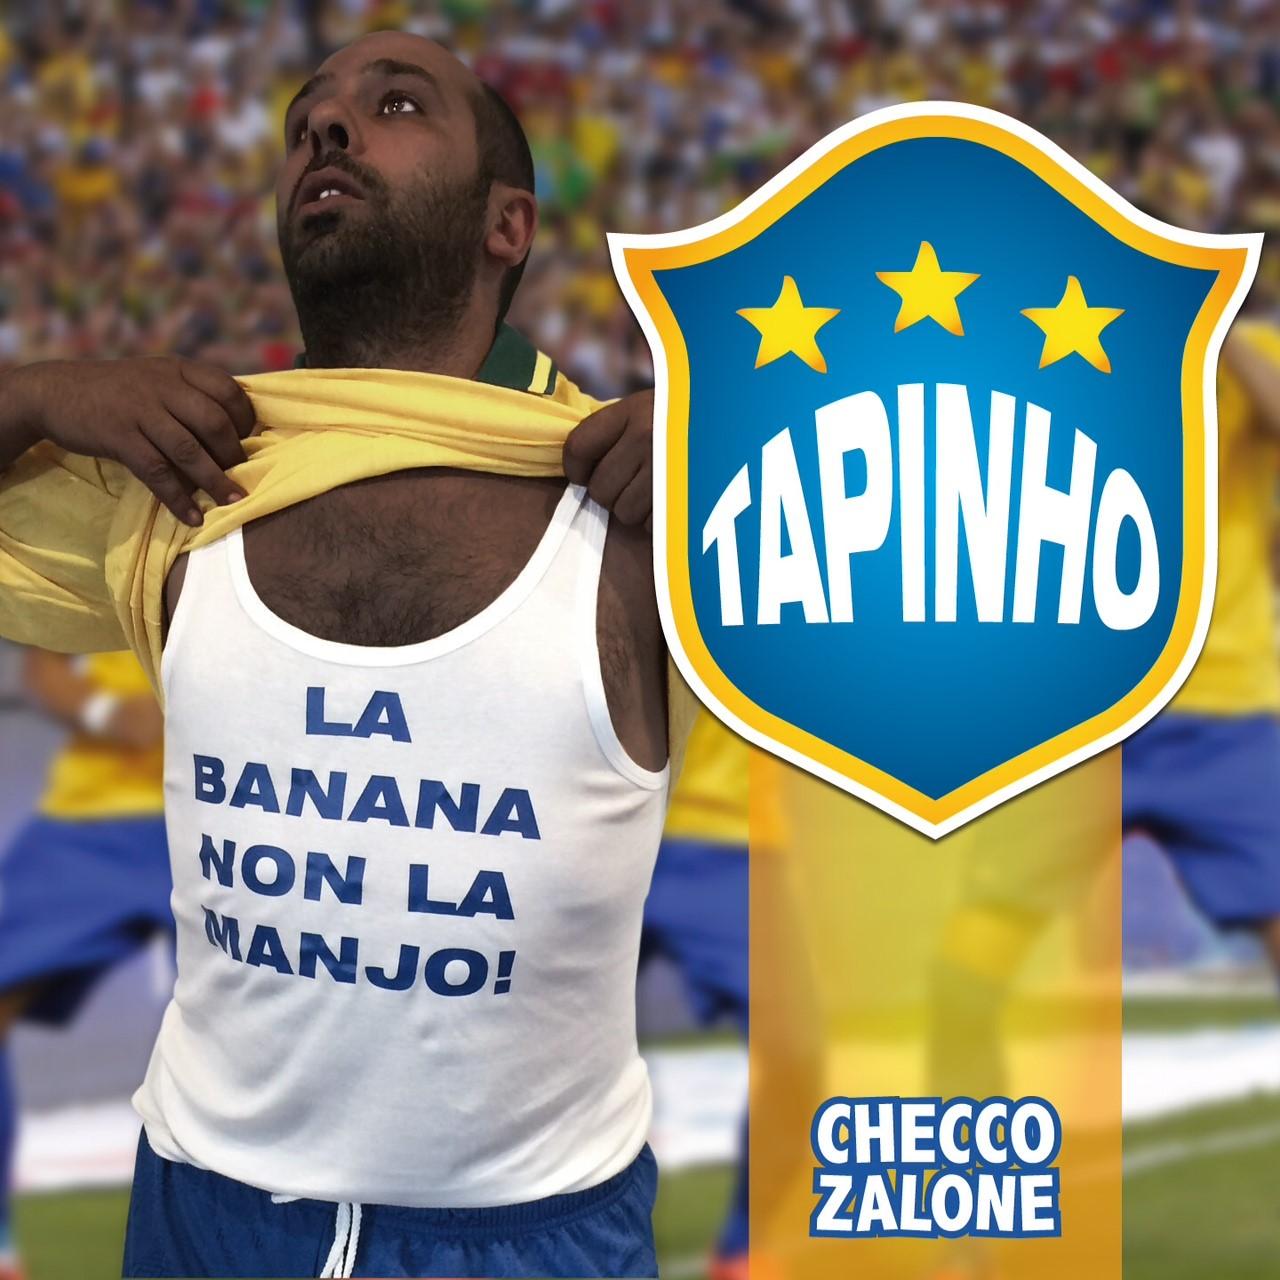 tapinho_zalone